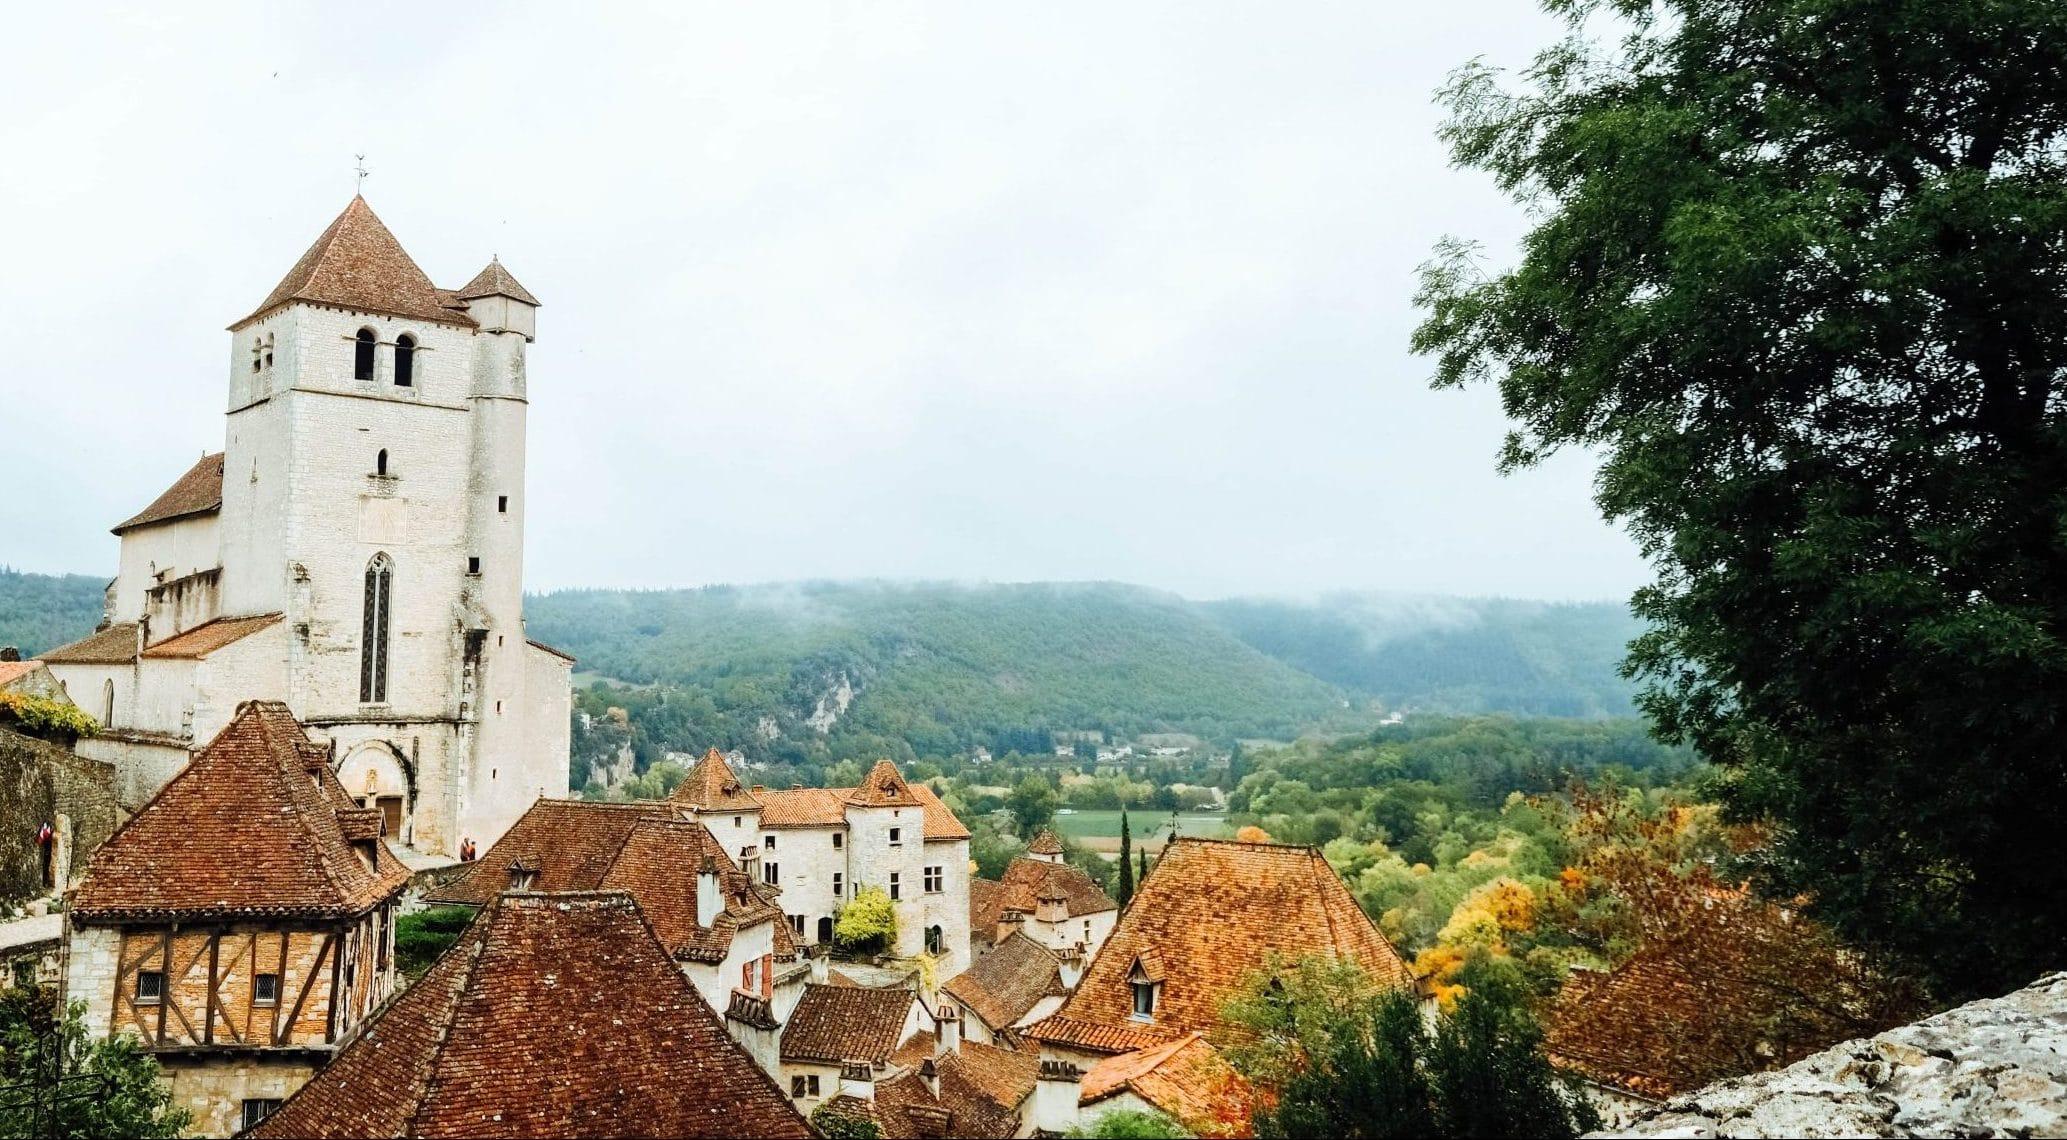 Saint-Cirq-Lapopie (Occitanie)